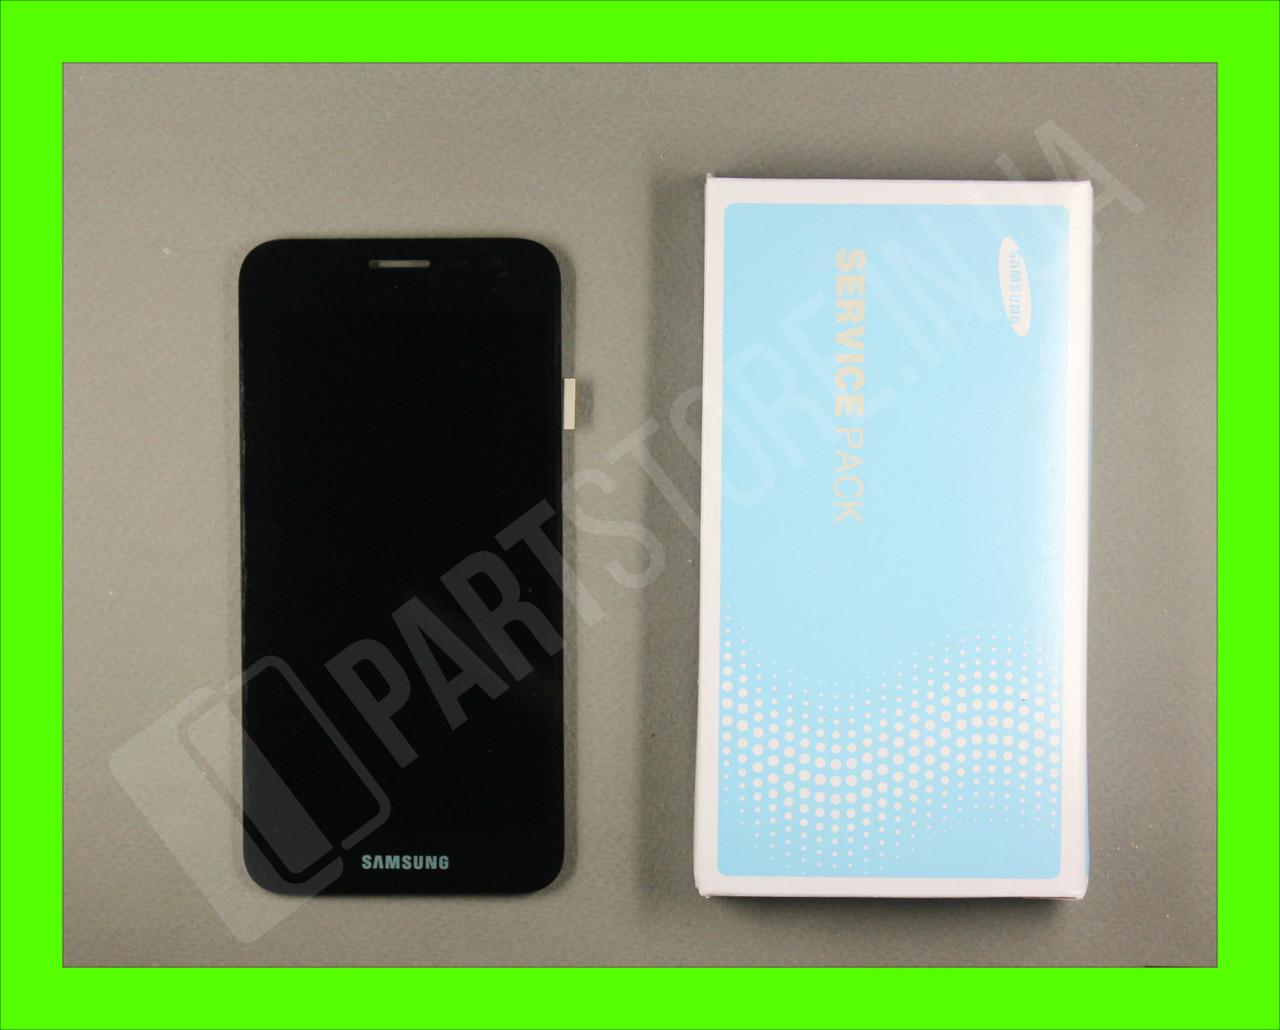 Дисплей Samsung j260 black j2 Core 2018 (GH97-22242A) сервисный оригинал